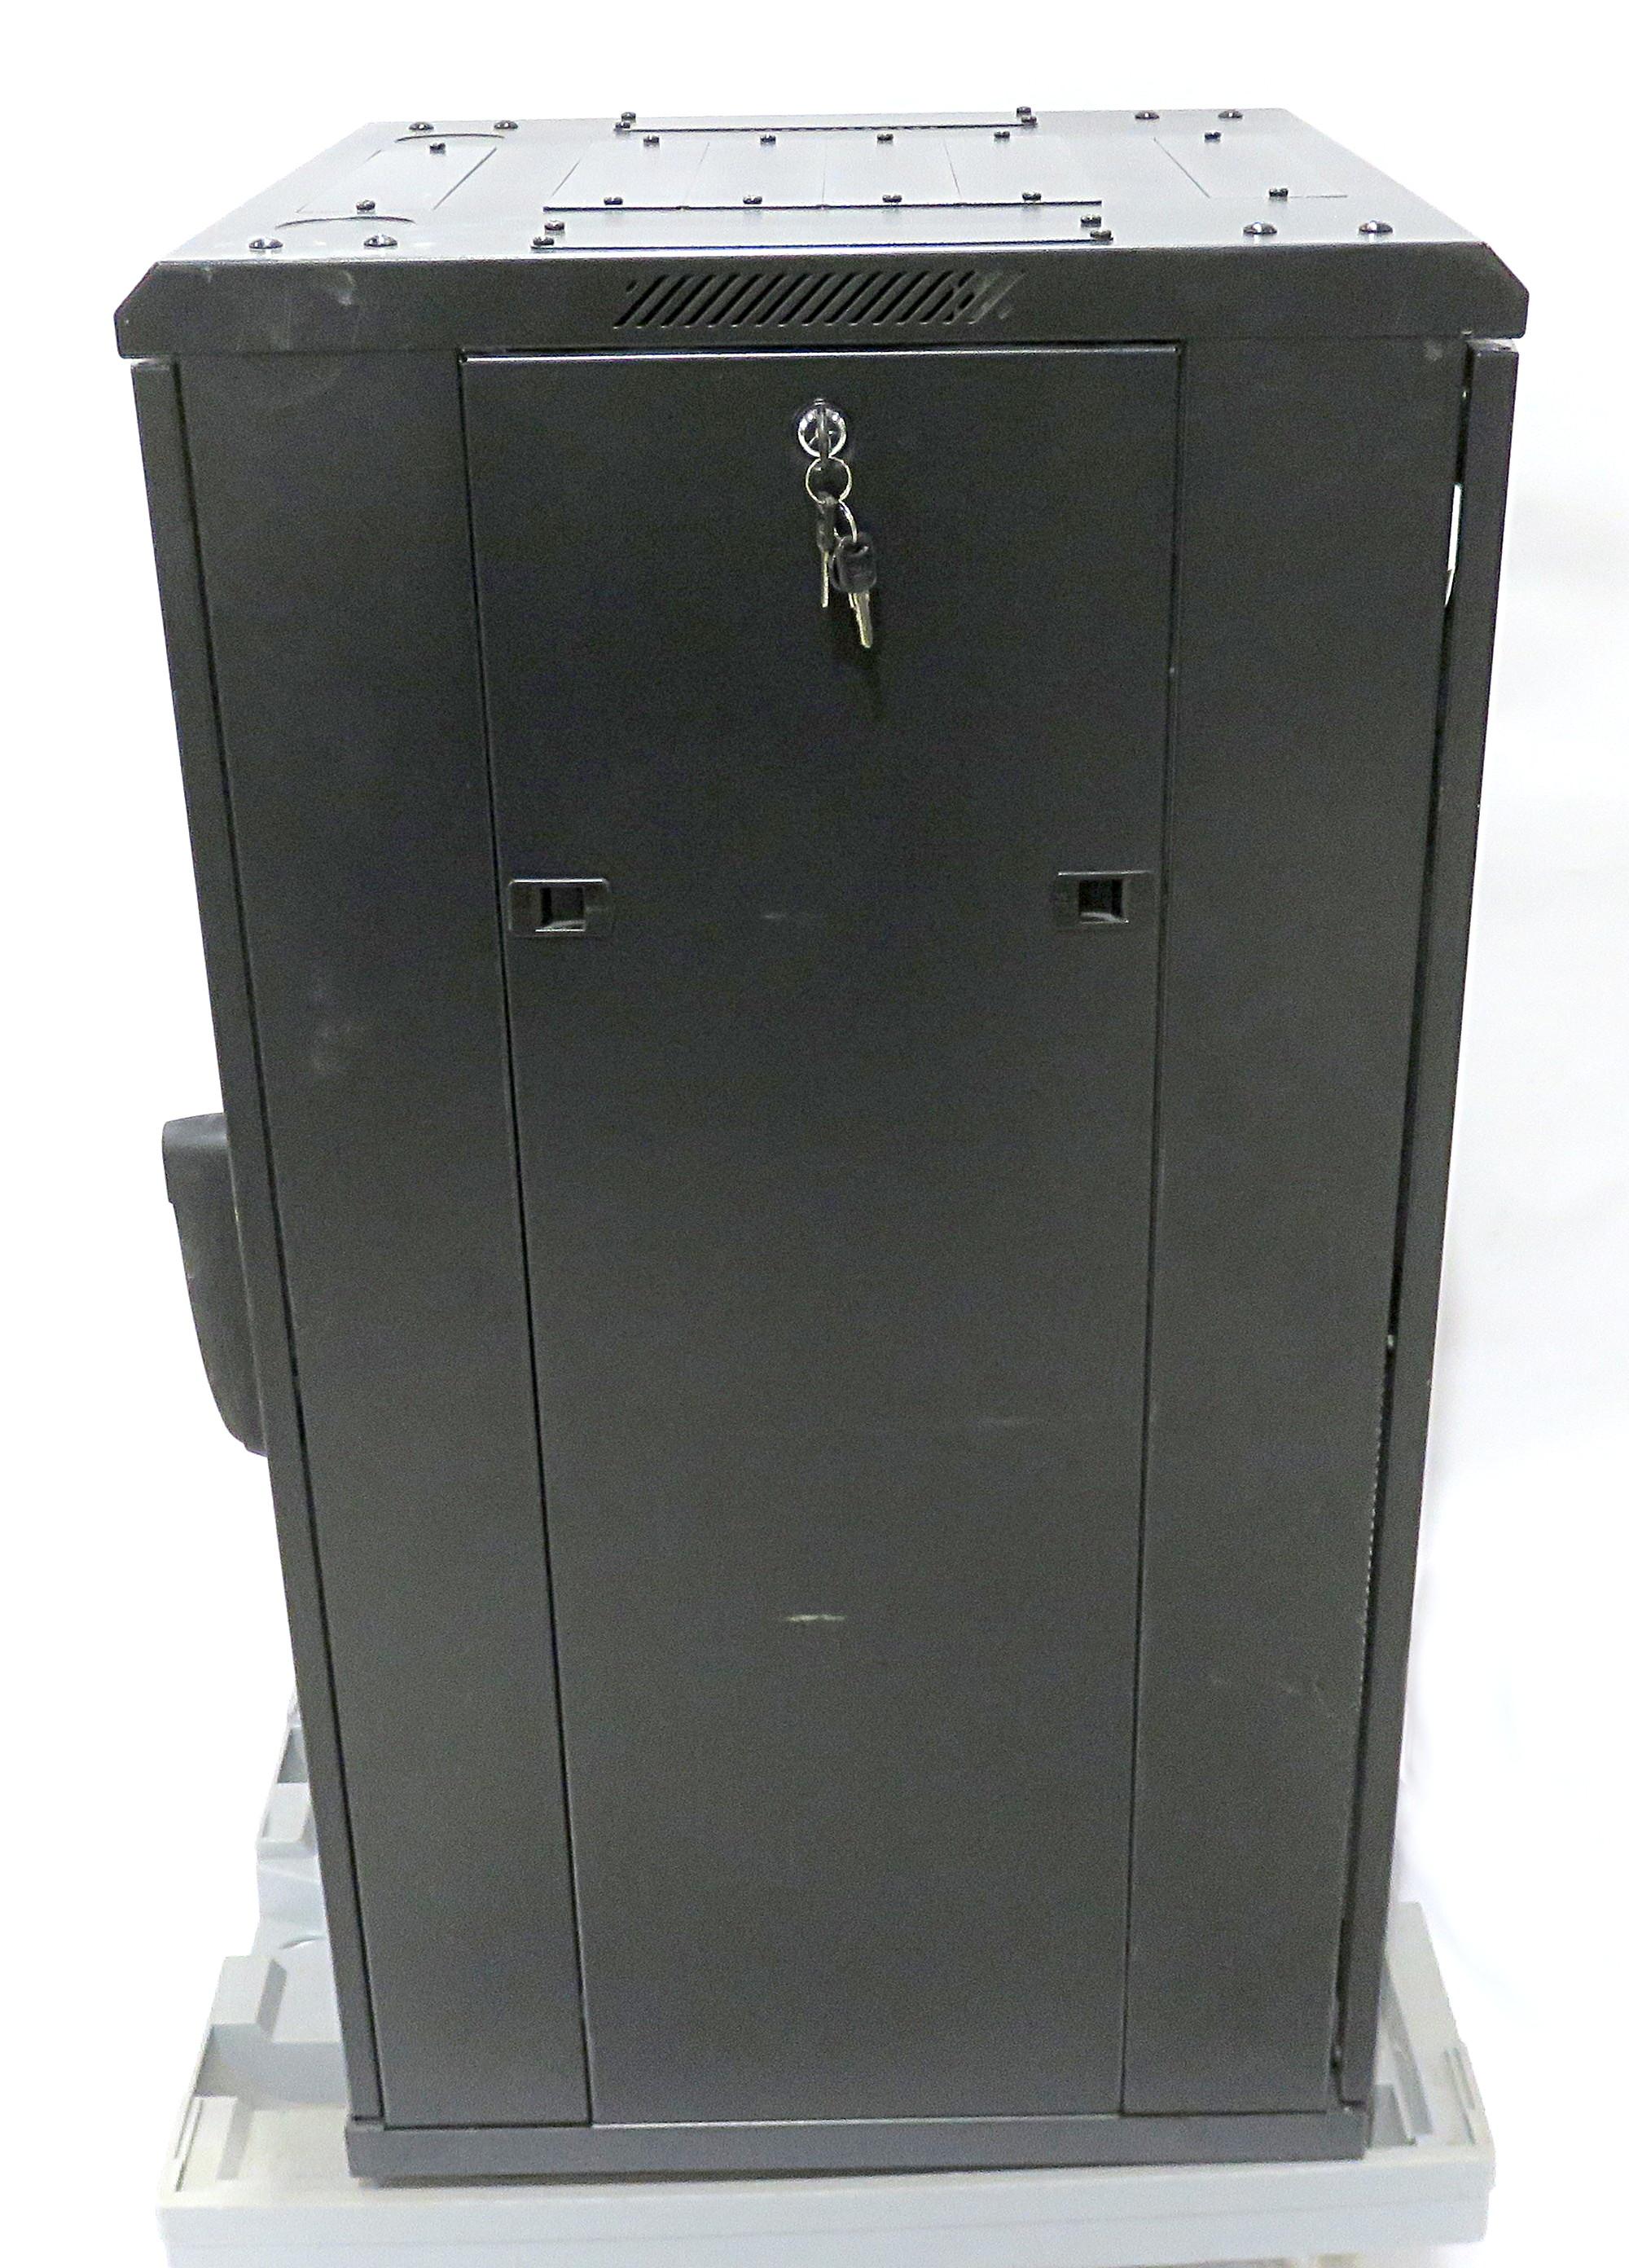 Rear Removable Side Panels Amp Keys Towerez 22u 19 Quot Server